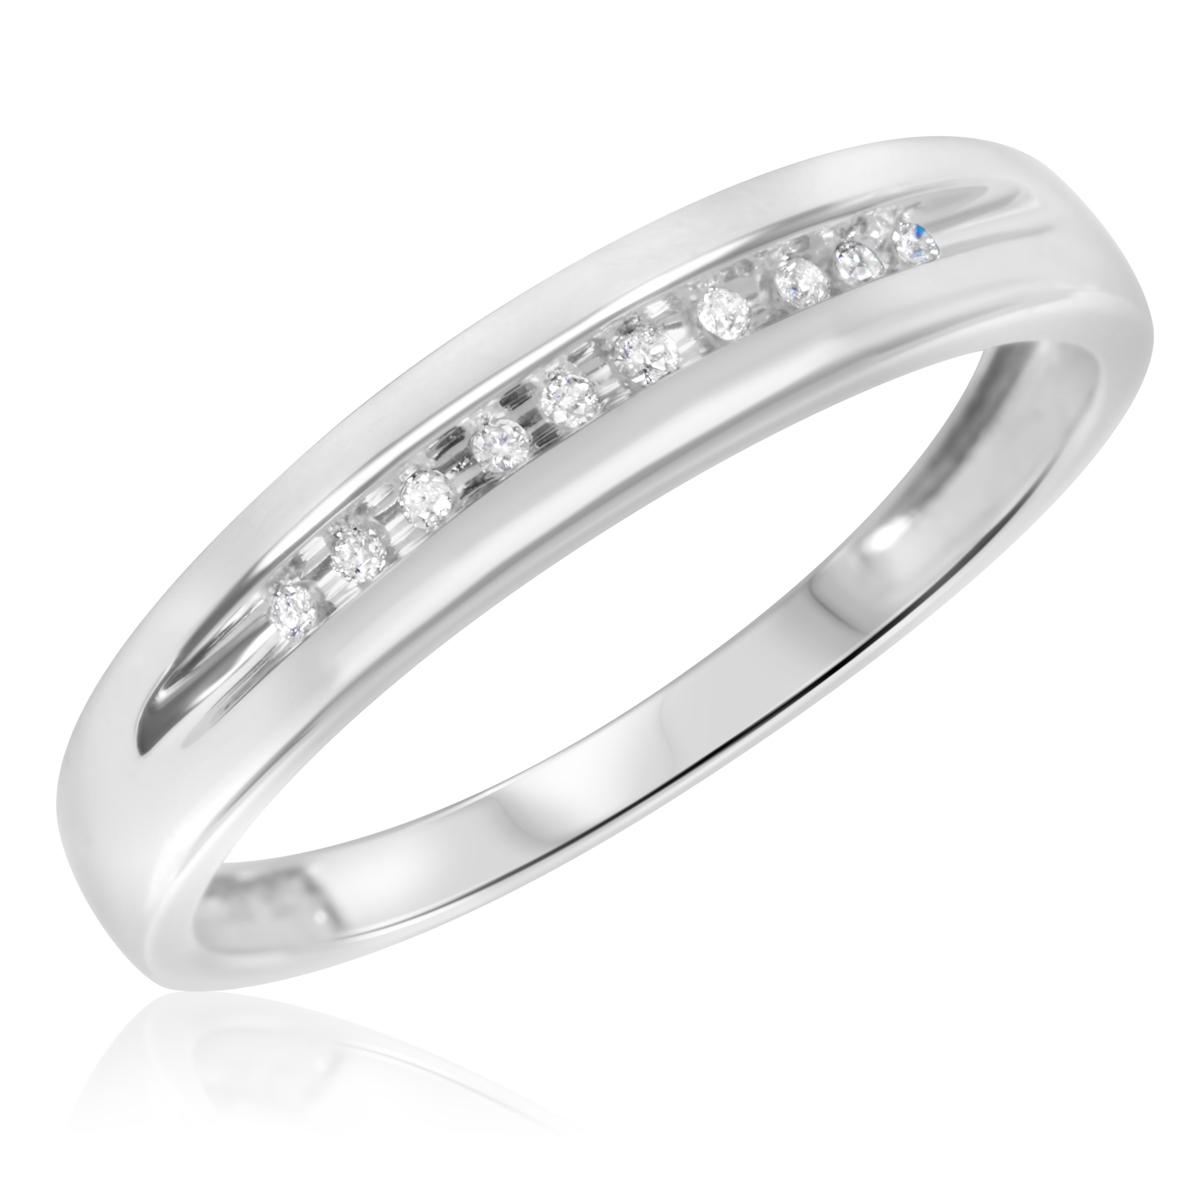 1/15 CT. T.W. Round Cut Diamond Men's Wedding Band 14K White Gold- Size 8